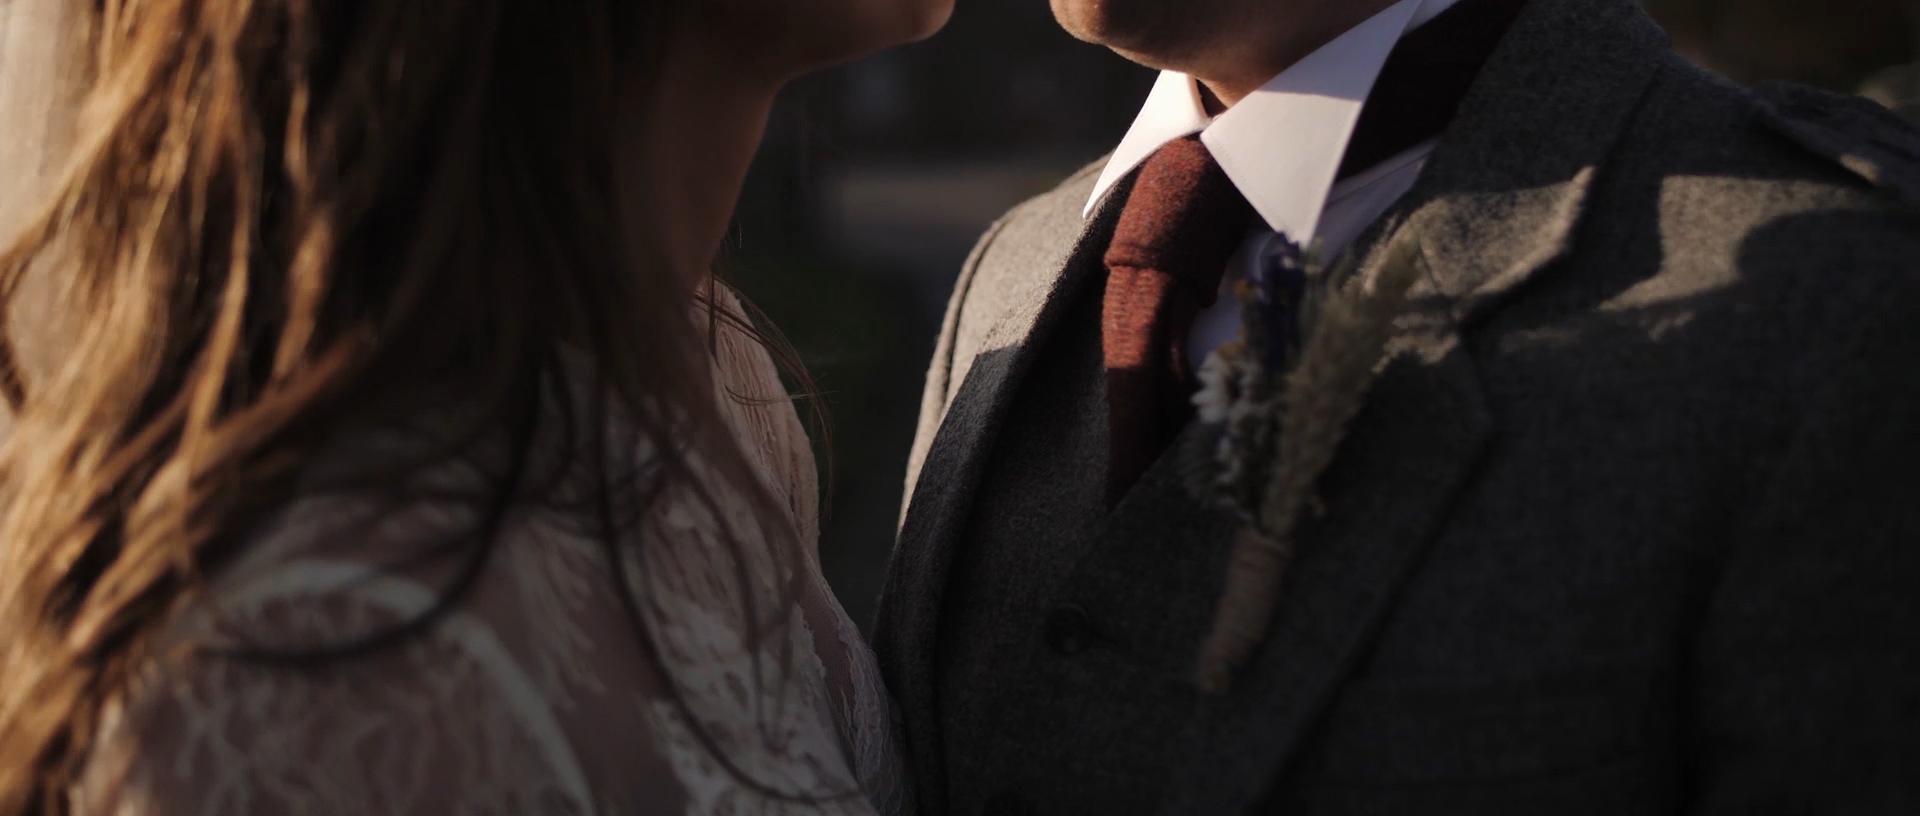 inverness-wedding-videographer_LL_04.jpg